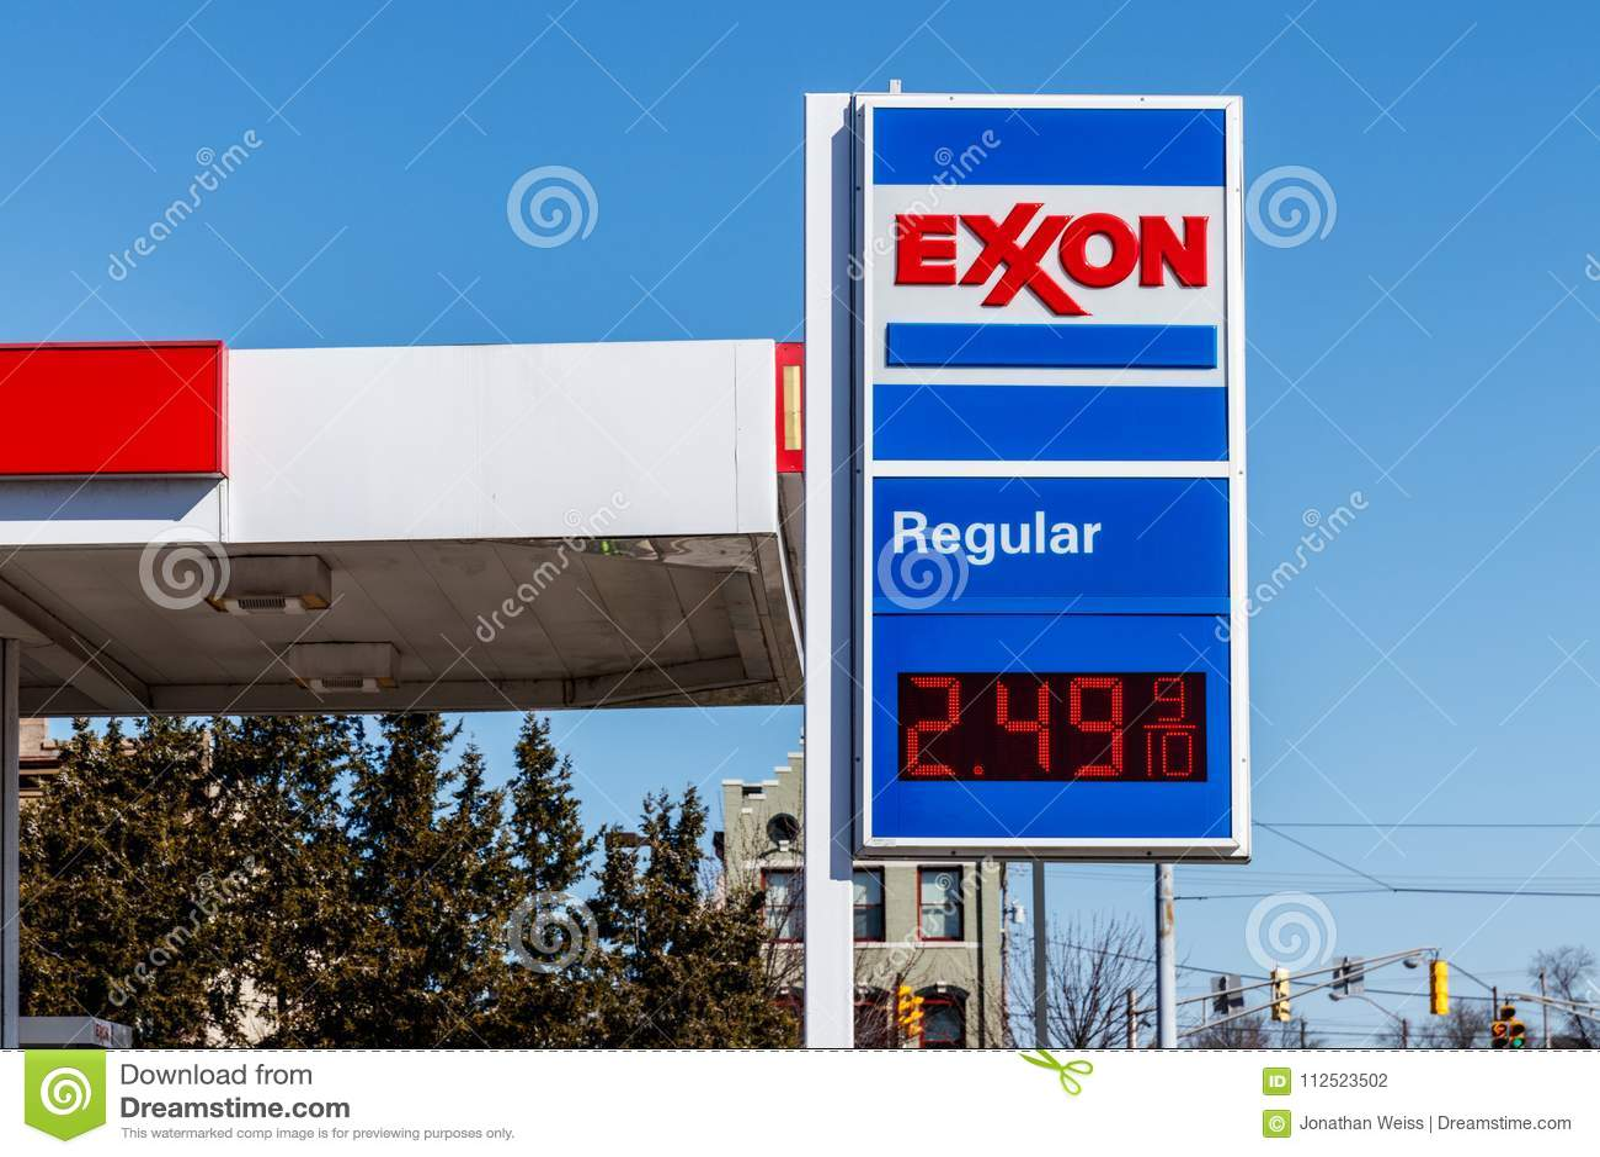 Noblesville - circa marzo de 2018: Exxon Retail Gas Location ExxonMobil es el ` s Largest Oil and Gas Company del mundo II